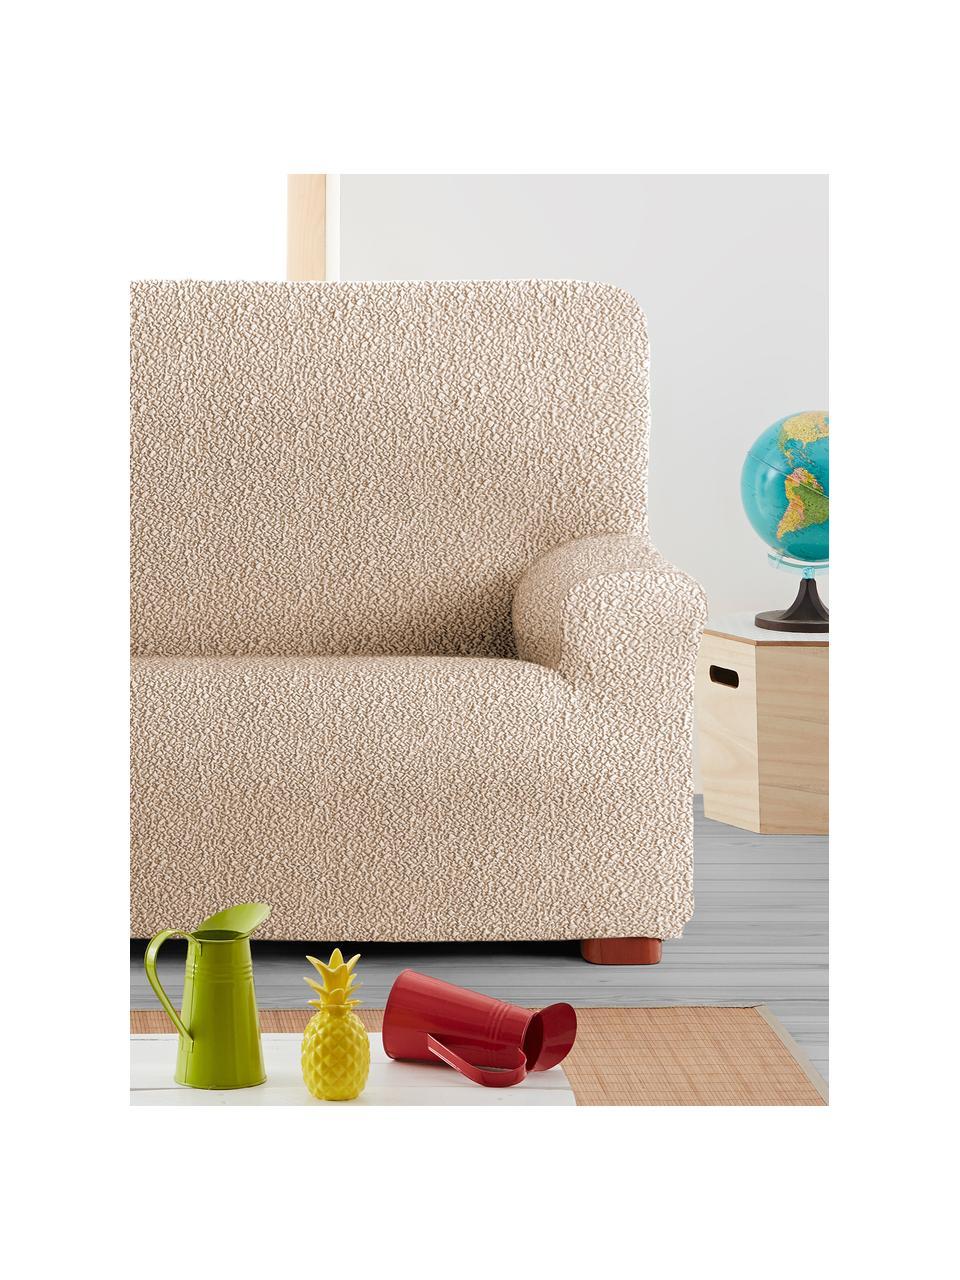 Copertura divano Roc, 55% poliestere, 35% cotone, 10% elastomero, Beige, Larg. 200 x Alt. 120 cm